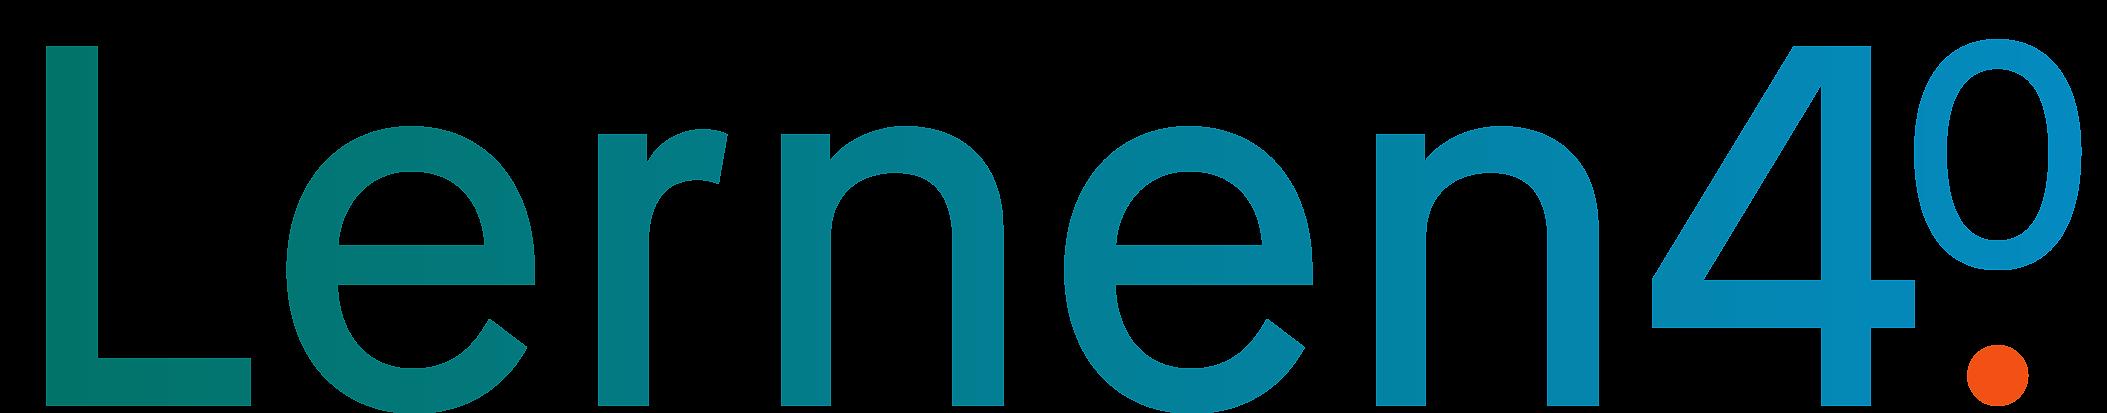 SupraTix Logo